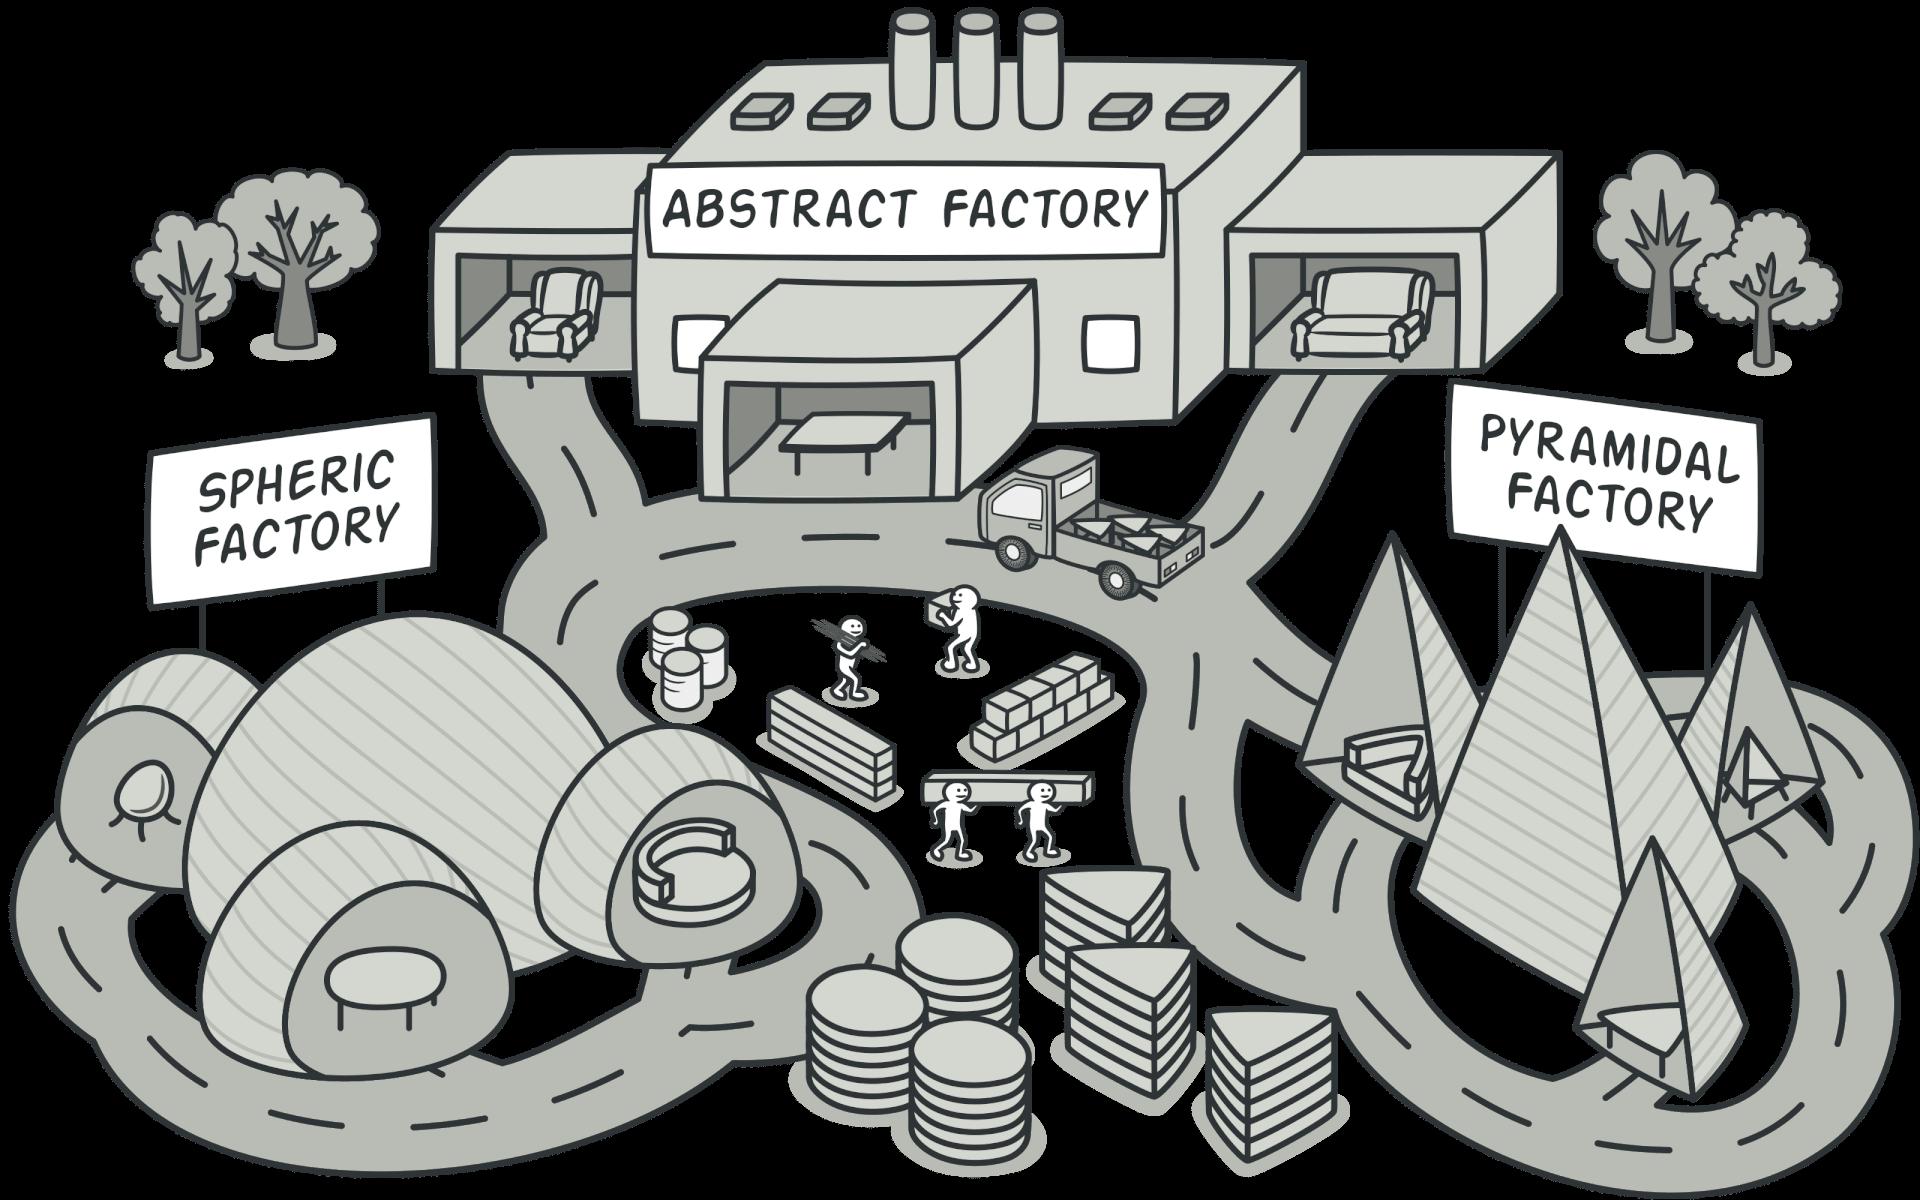 abstract-factory-pattern-la-gi